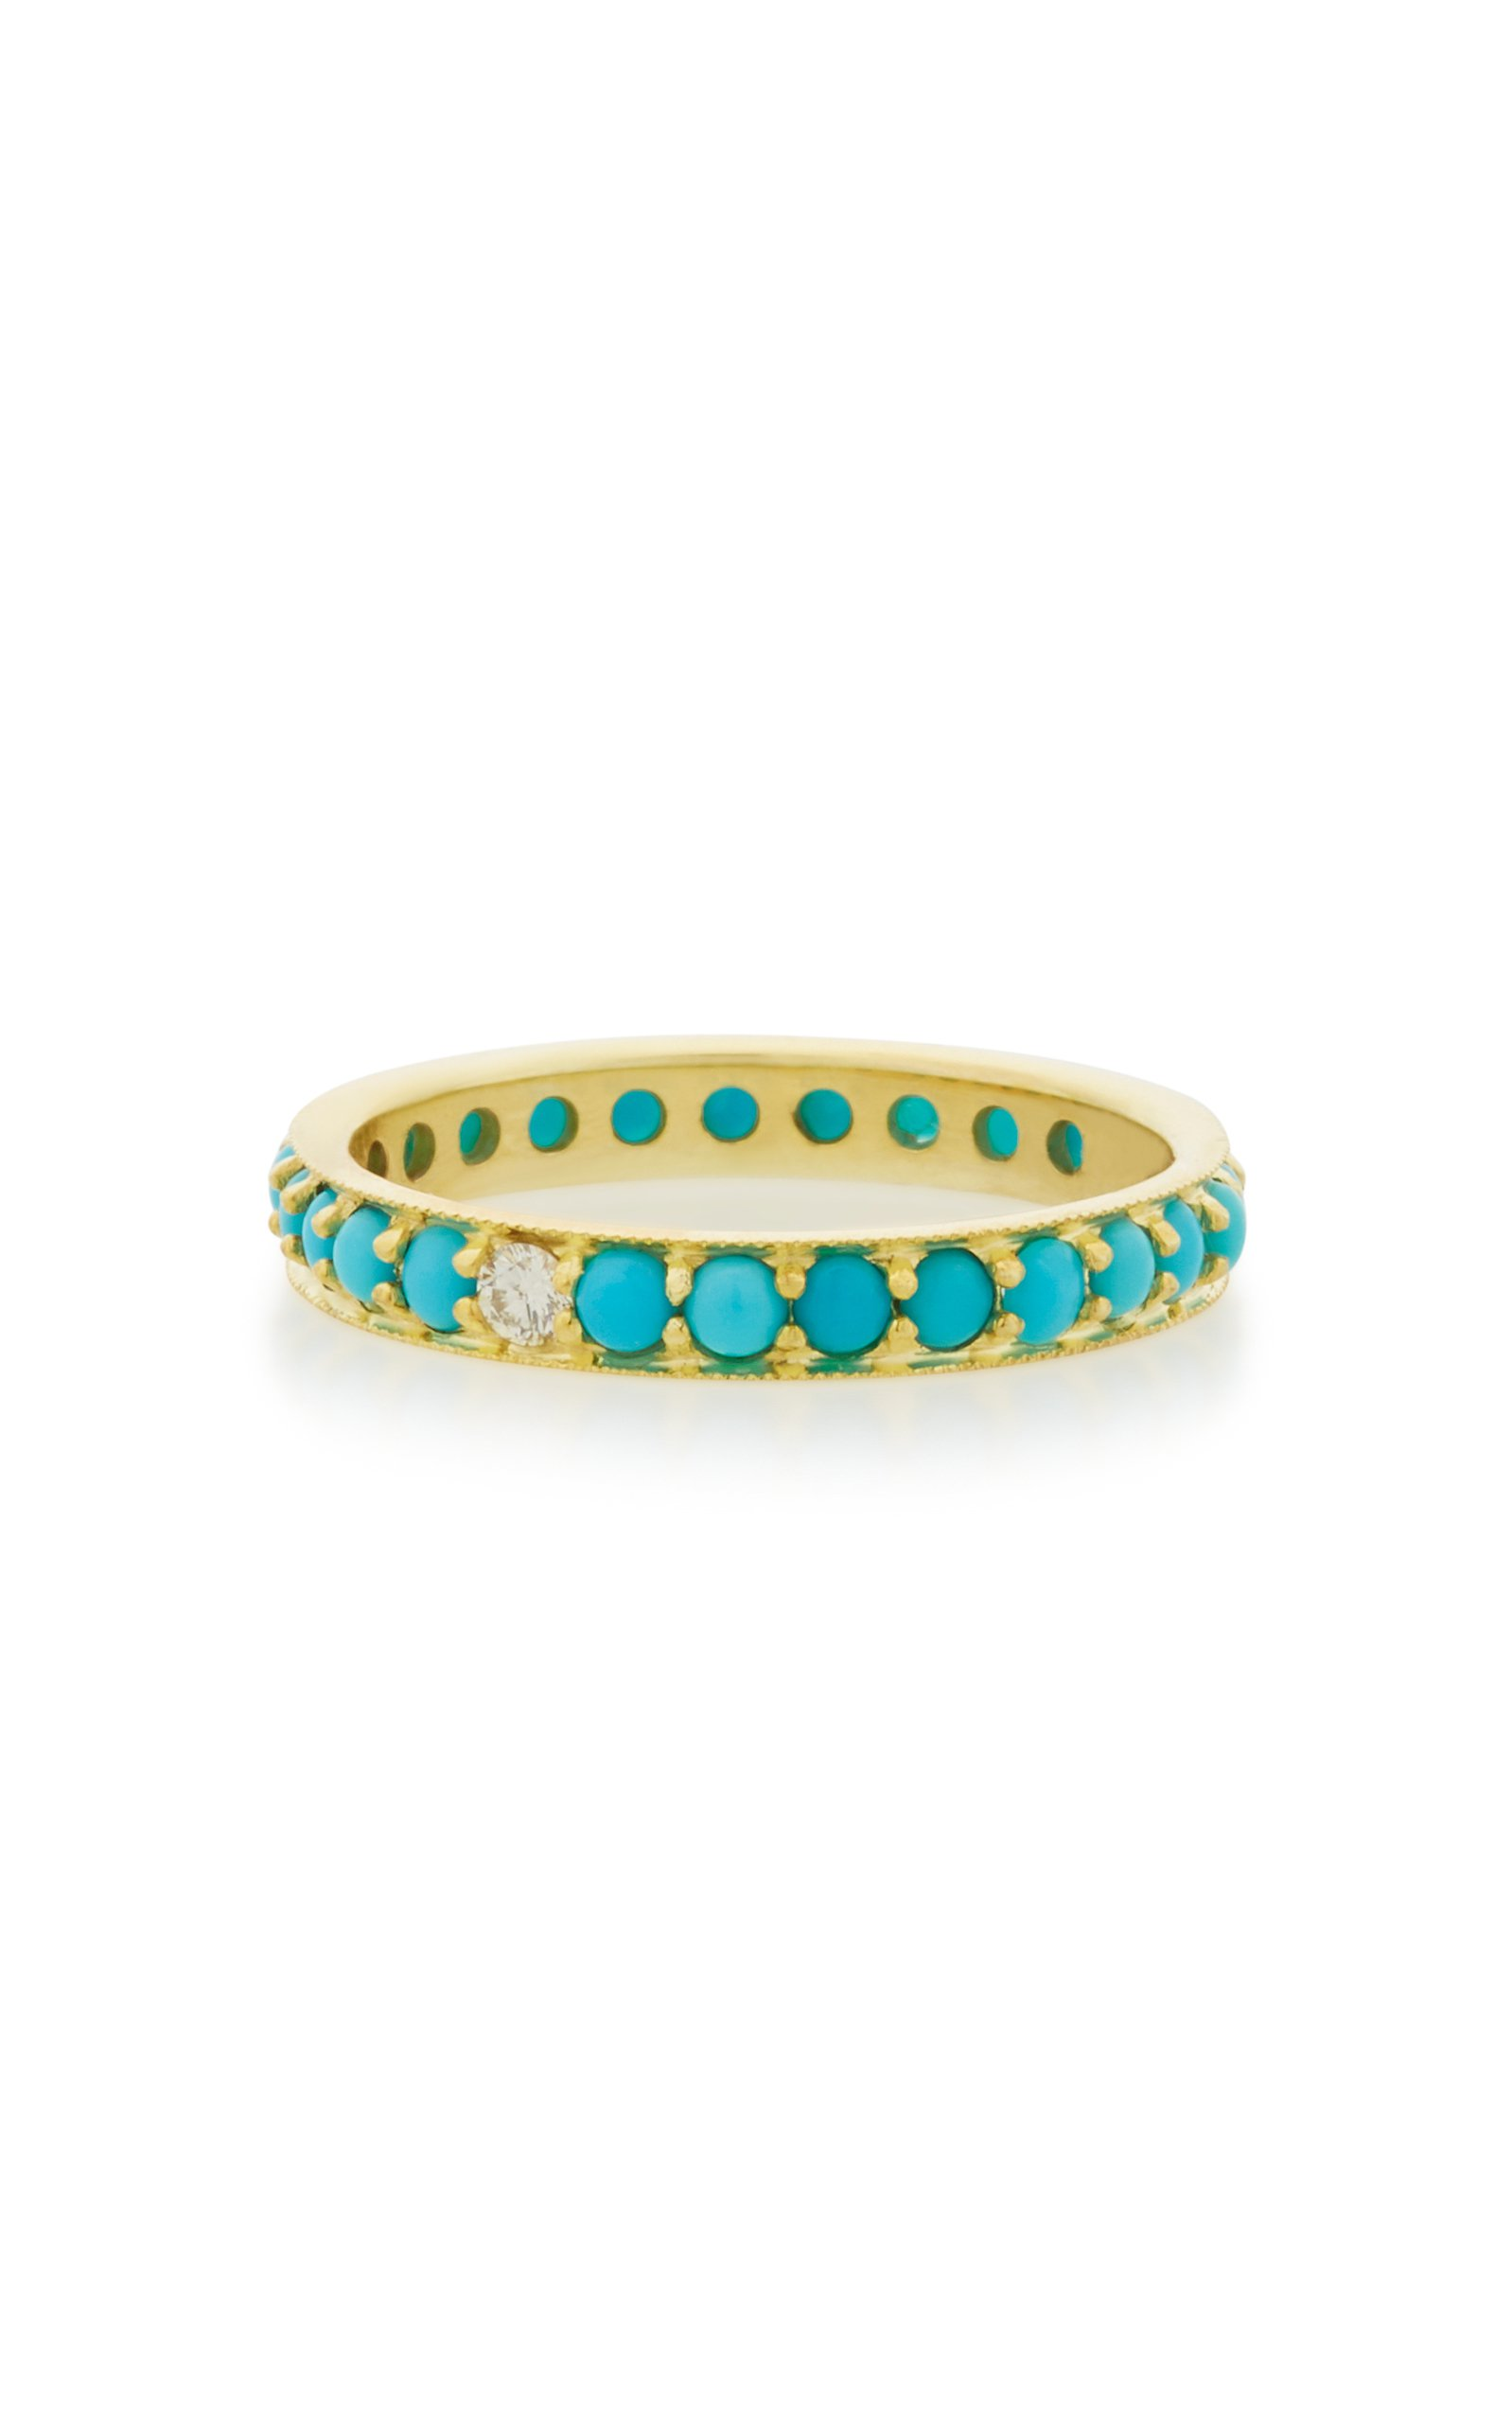 ILA Dunbar 14K Gold Turquoise and Diamond Ring